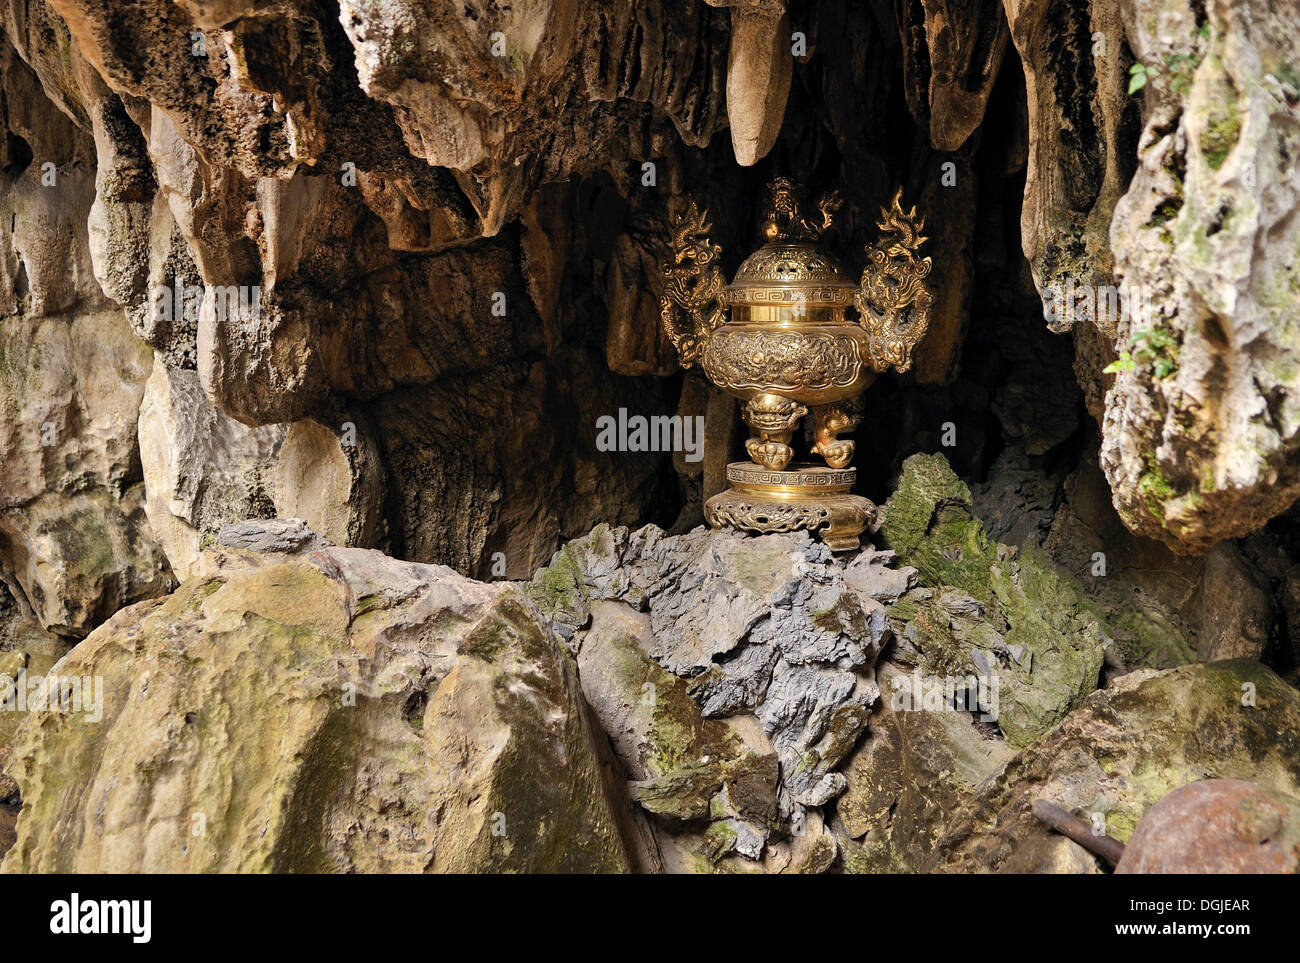 Holy chalice in the Huong Tich Pagoda, Perfume Pagoda, near Ninh Binh, dry Halong Bay, Vietnam, Southeast Asia - Stock Image